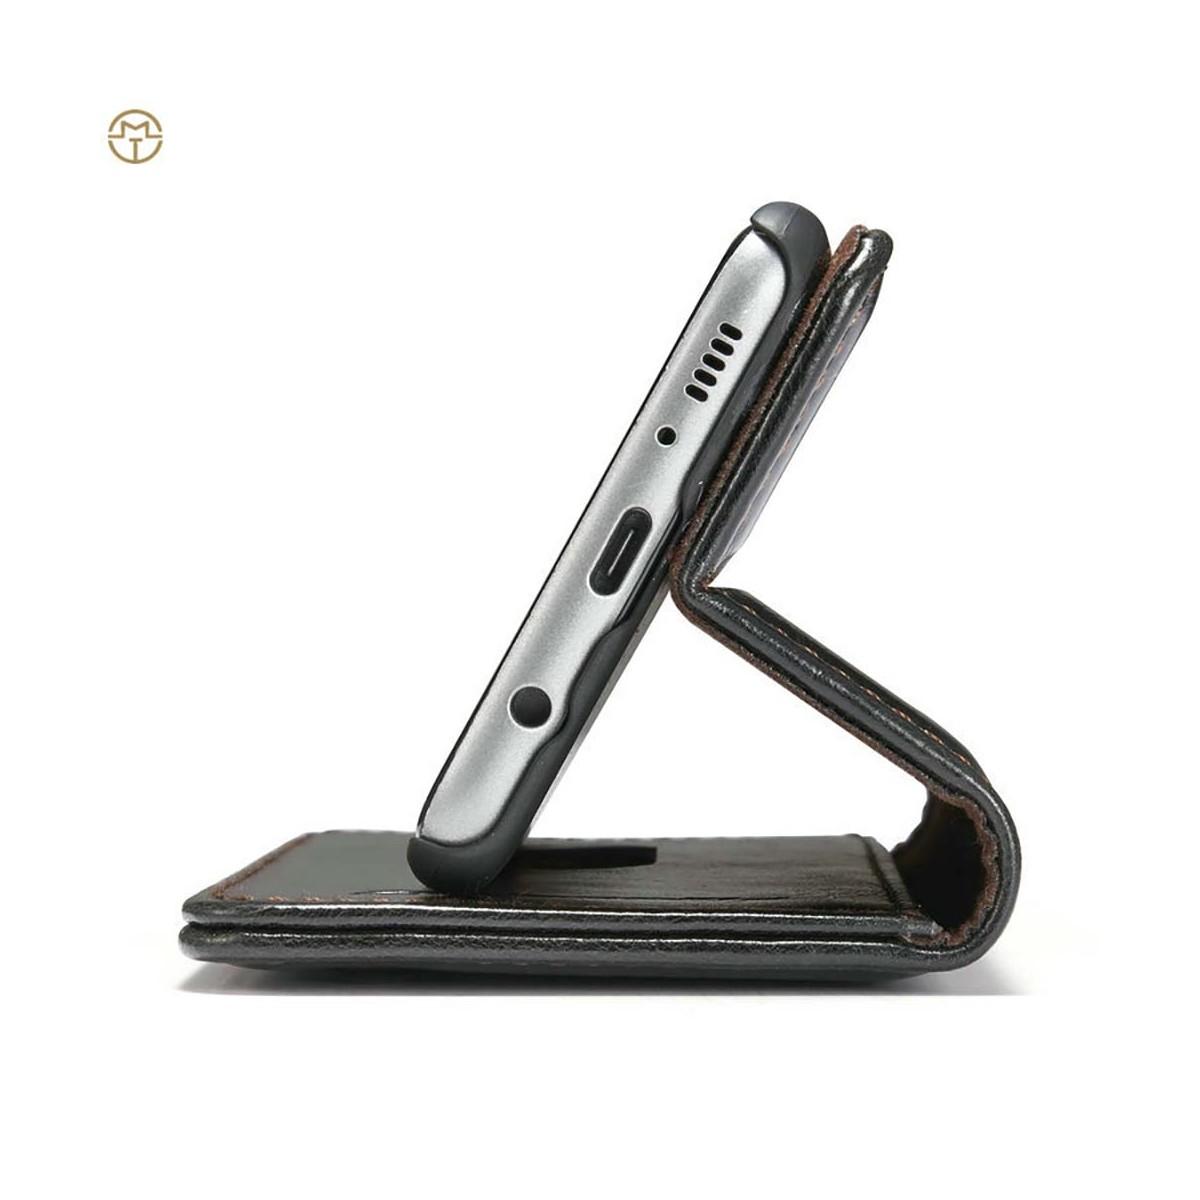 Etui Galaxy S8 Plus Porte cartes Noir - CaseMe